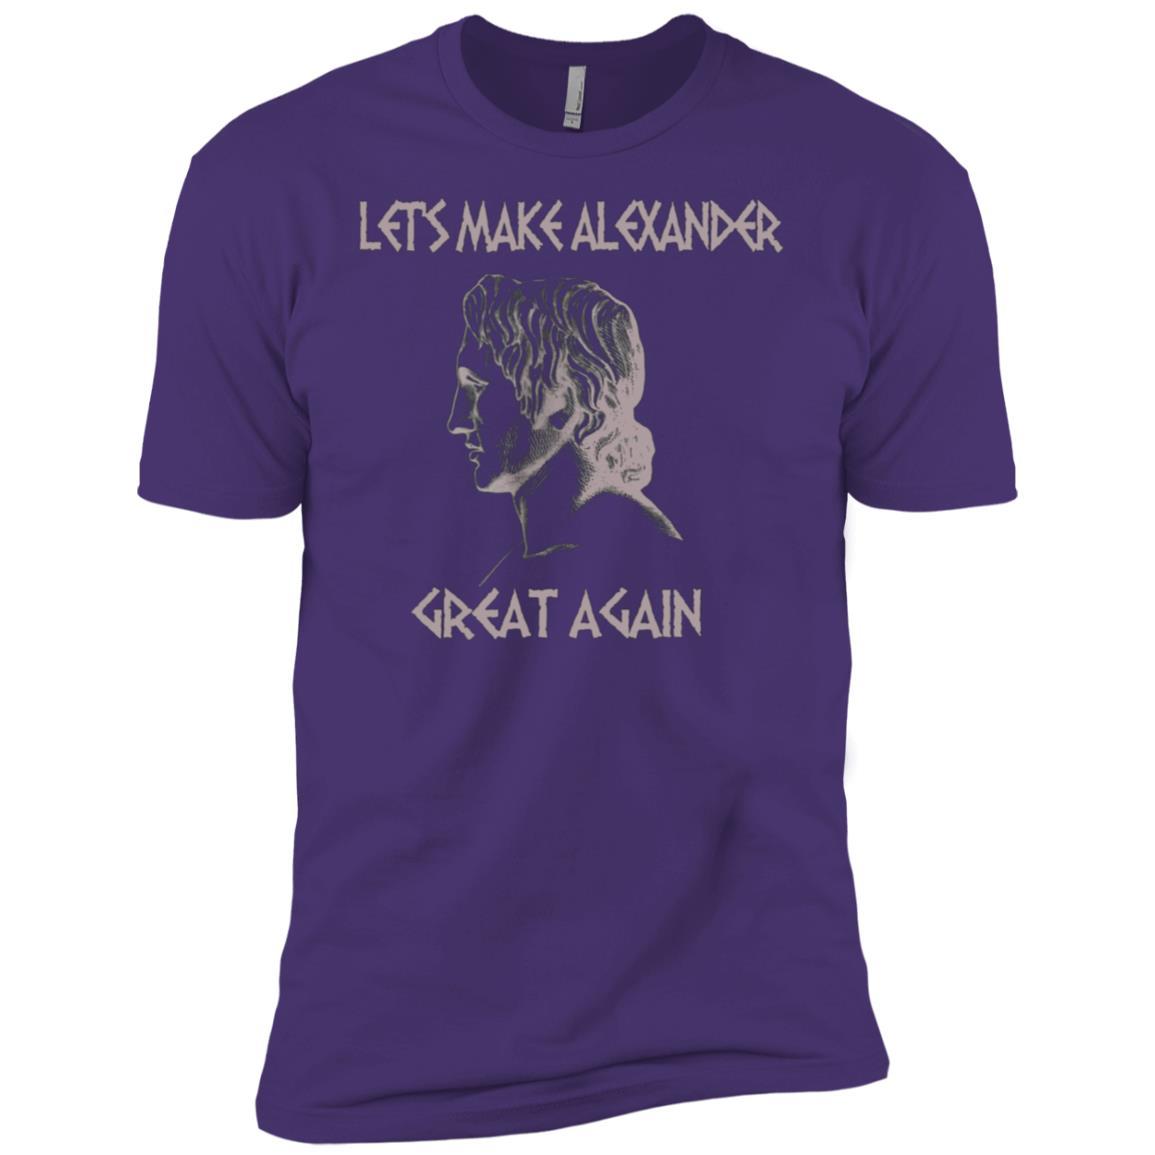 Let's make Alexander great again funny history Men Short Sleeve T-Shirt